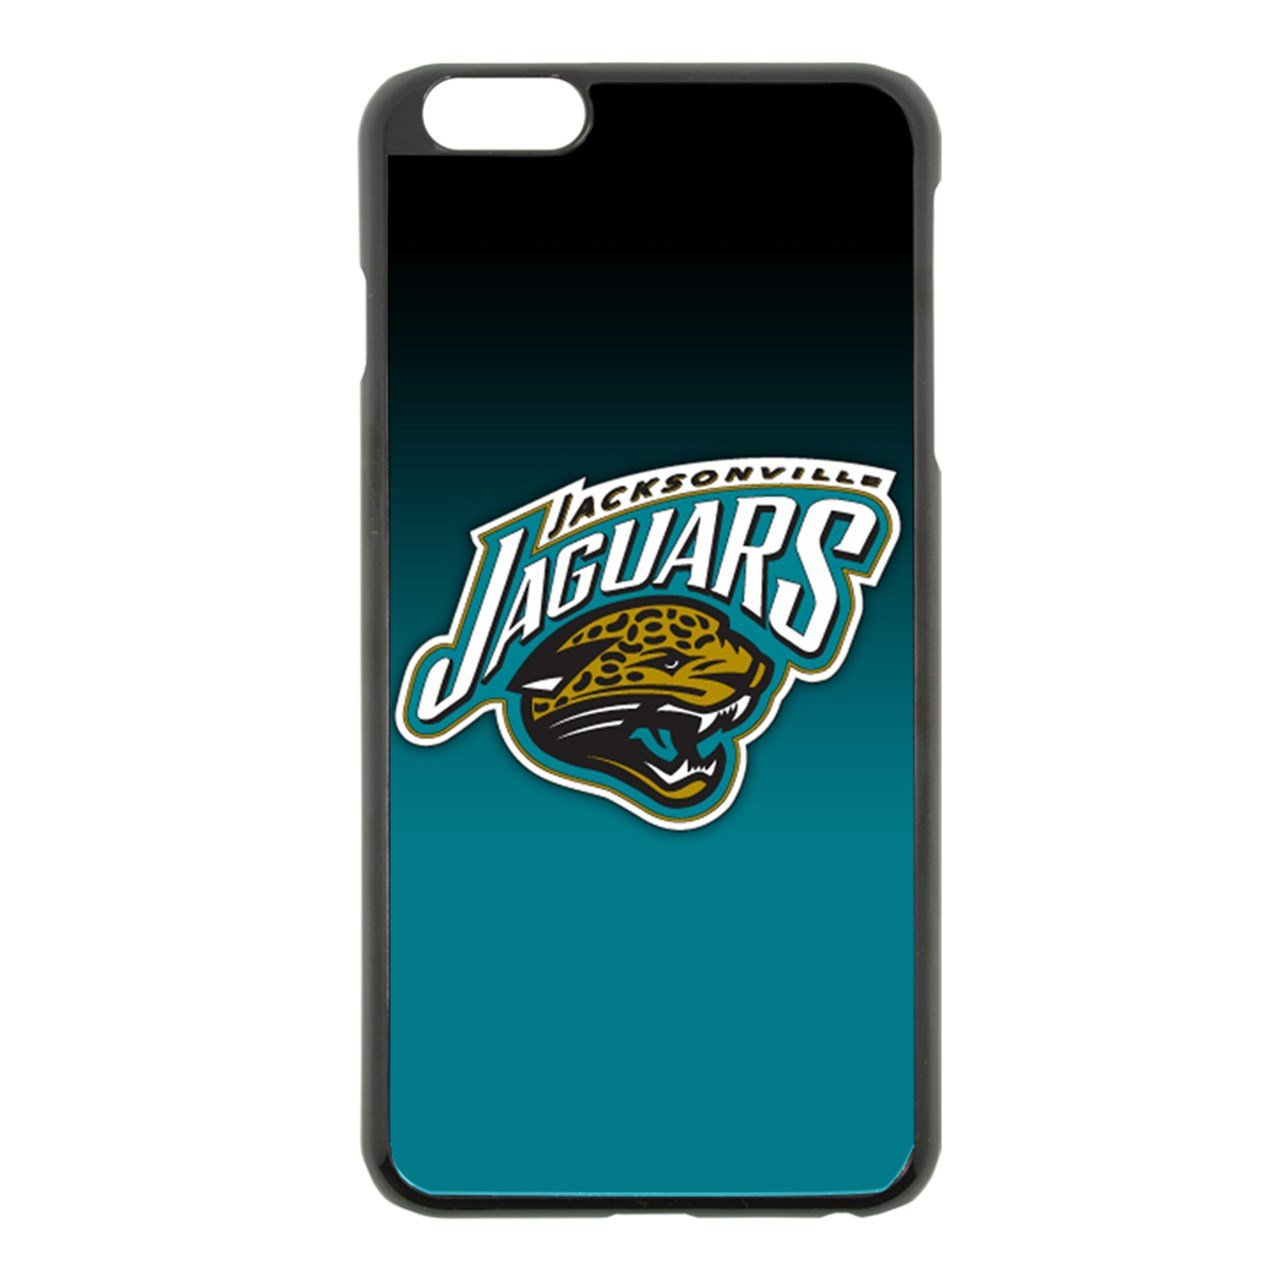 jacksonville jaguars Apple Funda iphone 6/6S Plus negro Case ...